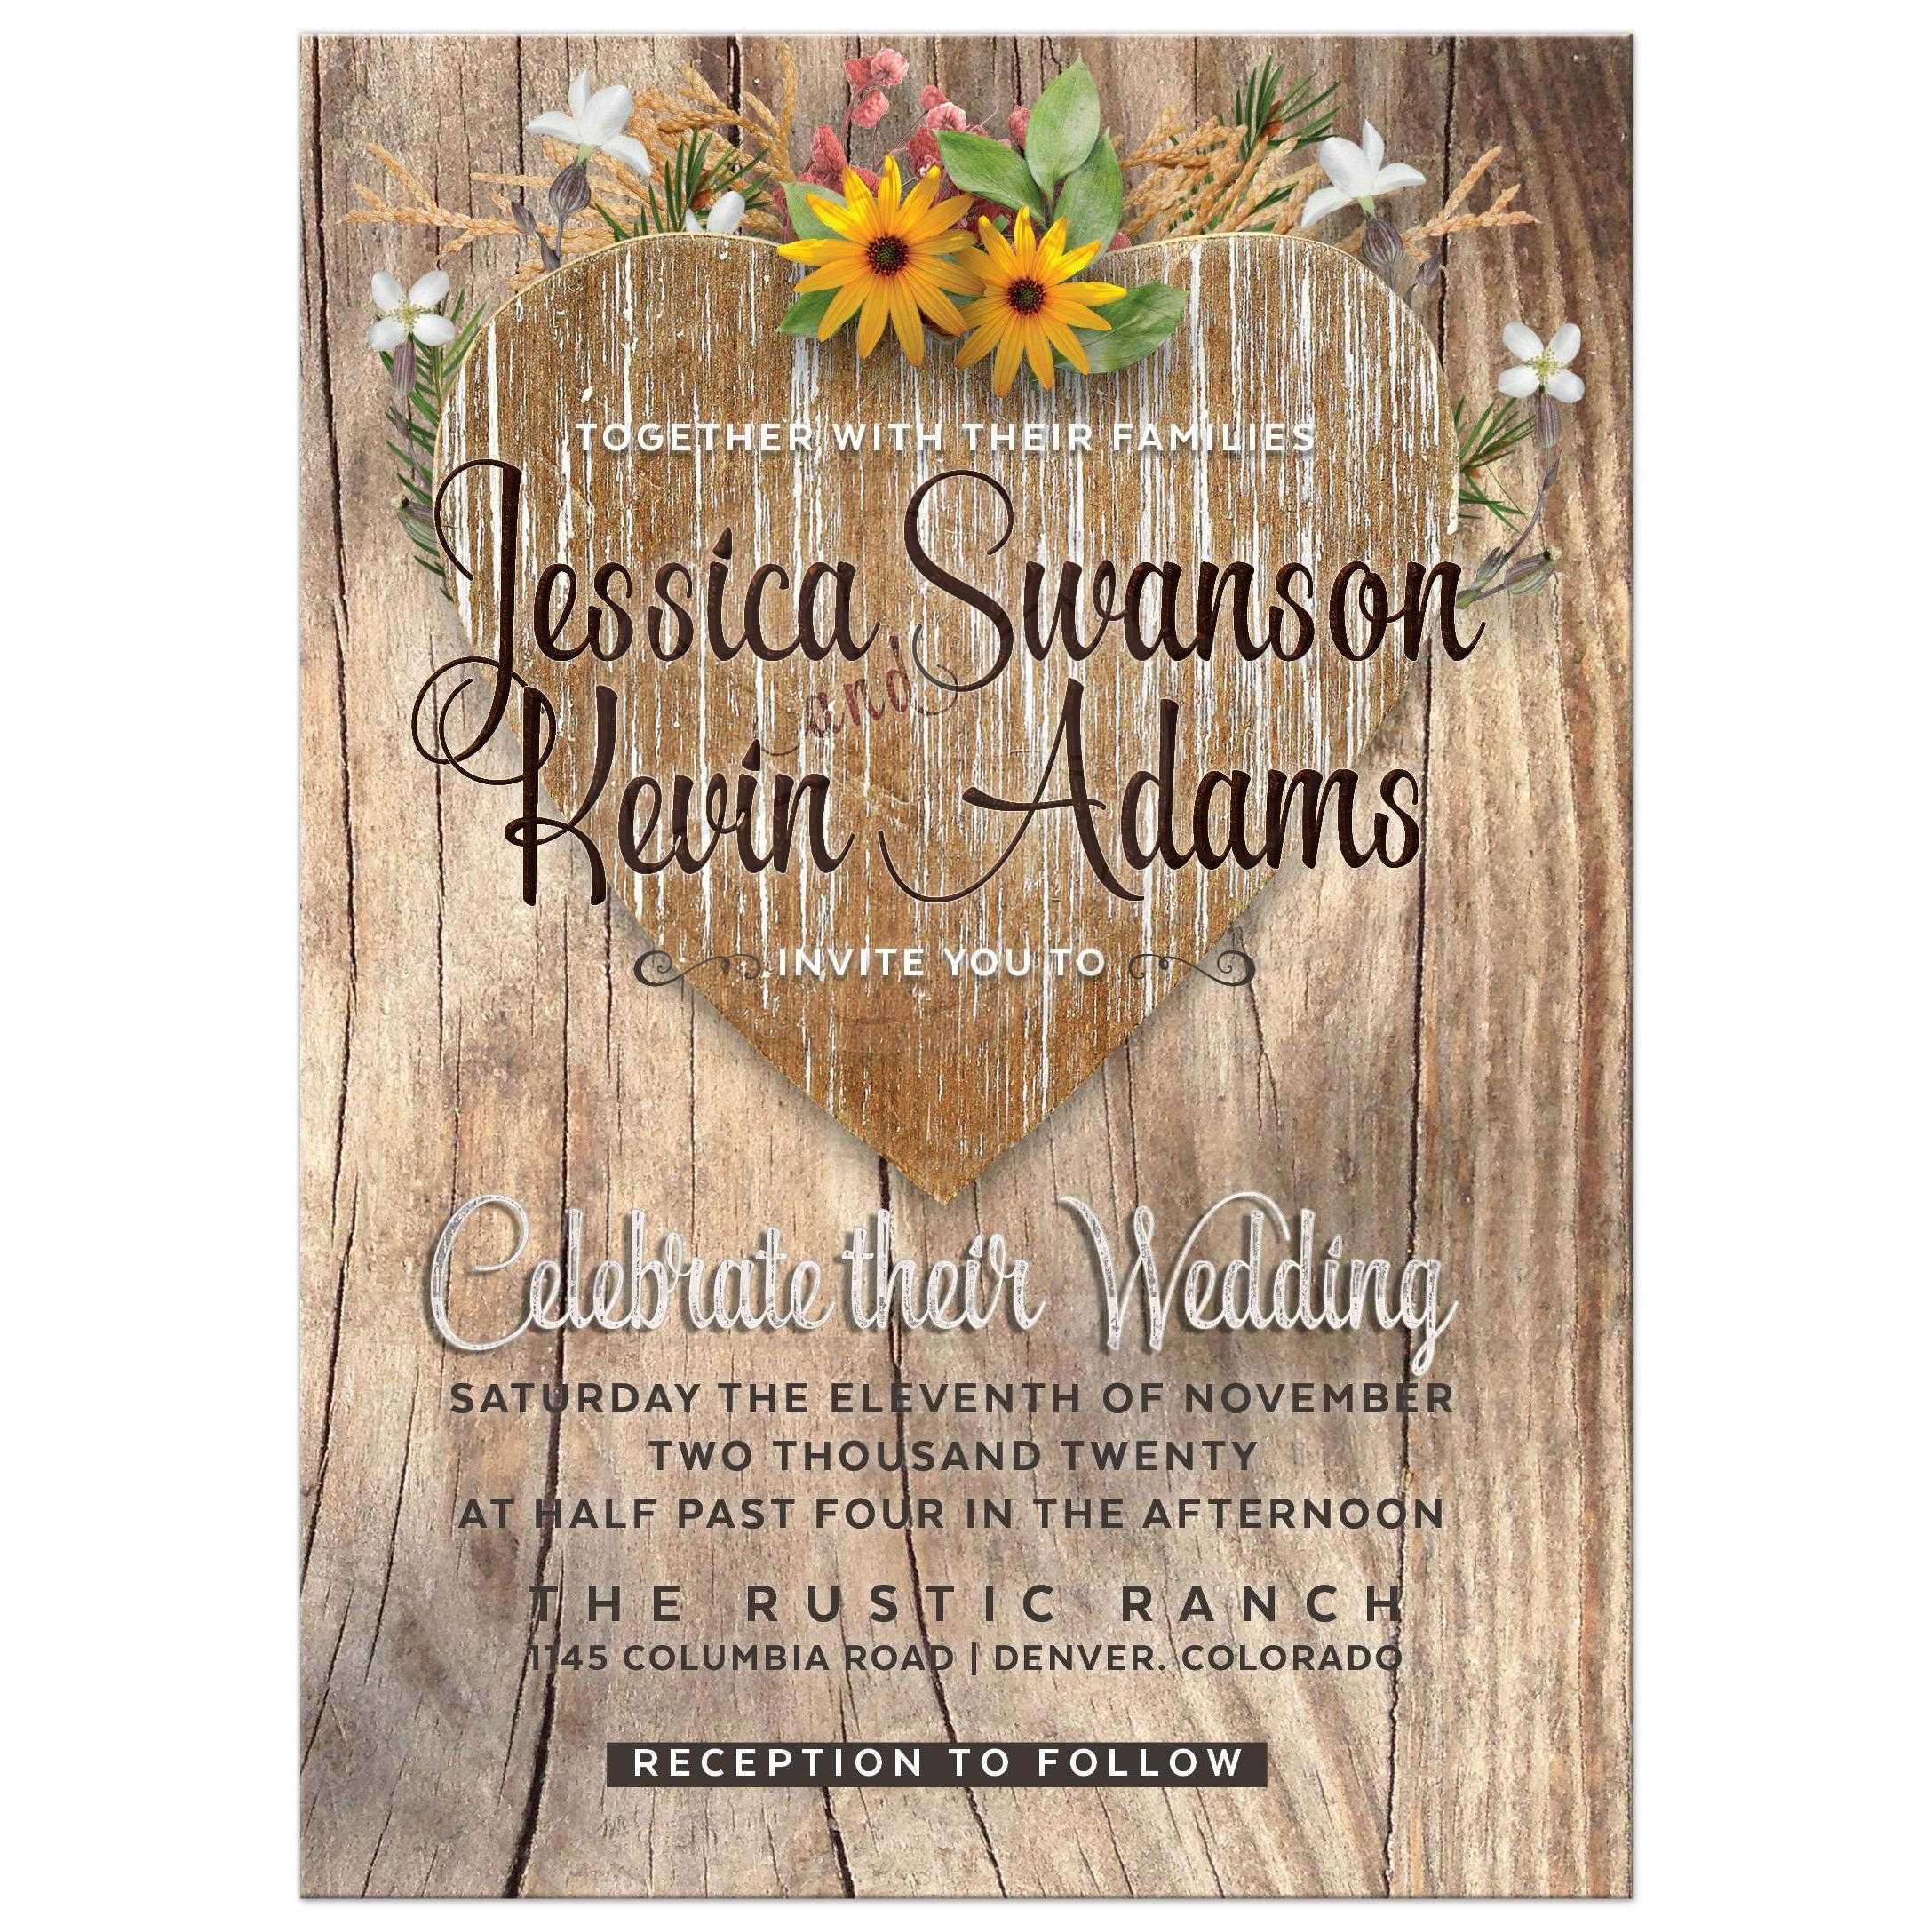 Rustic Wedding Invitations: Love Heart Wildflowers Rustic Wedding Invitation